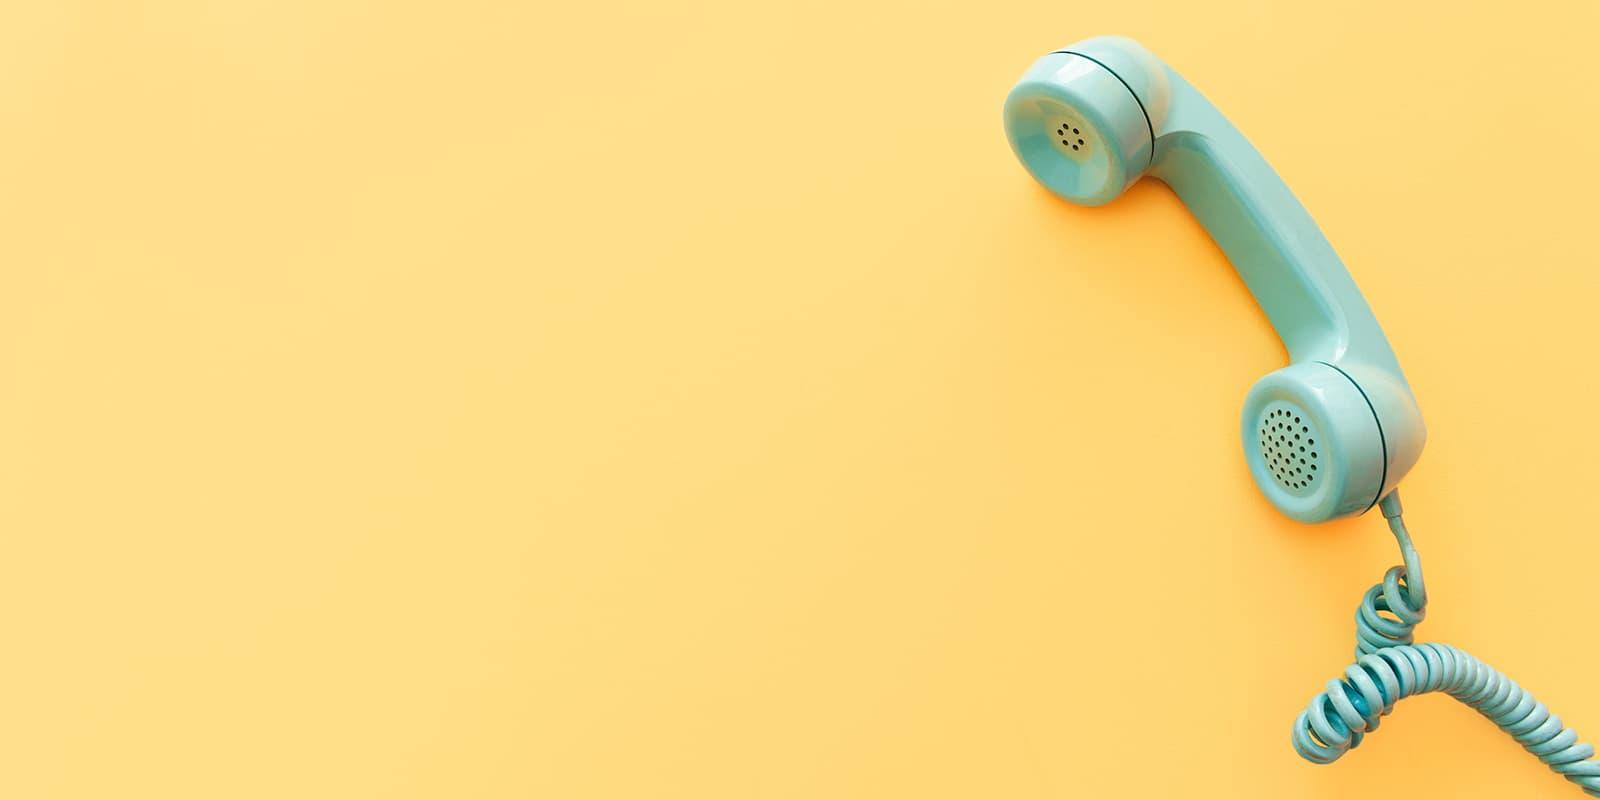 Telephone on yellow background.